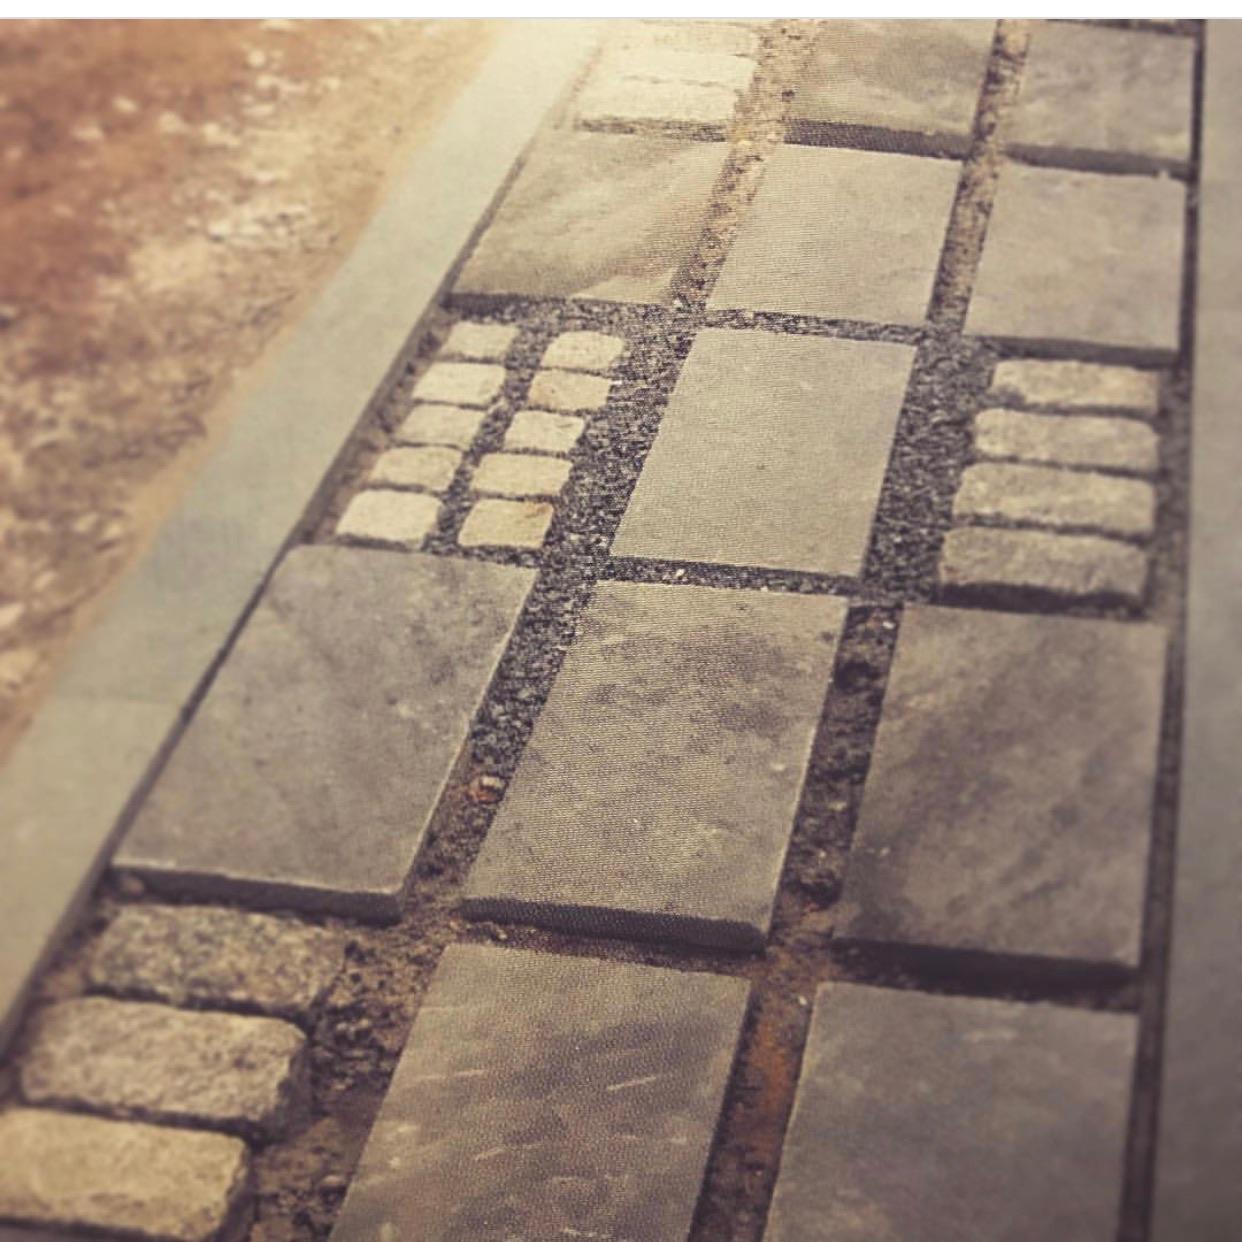 Granite sett,bluestone paver, and bluestone gravel path, detail. ©2018 twelve gardens ltd.